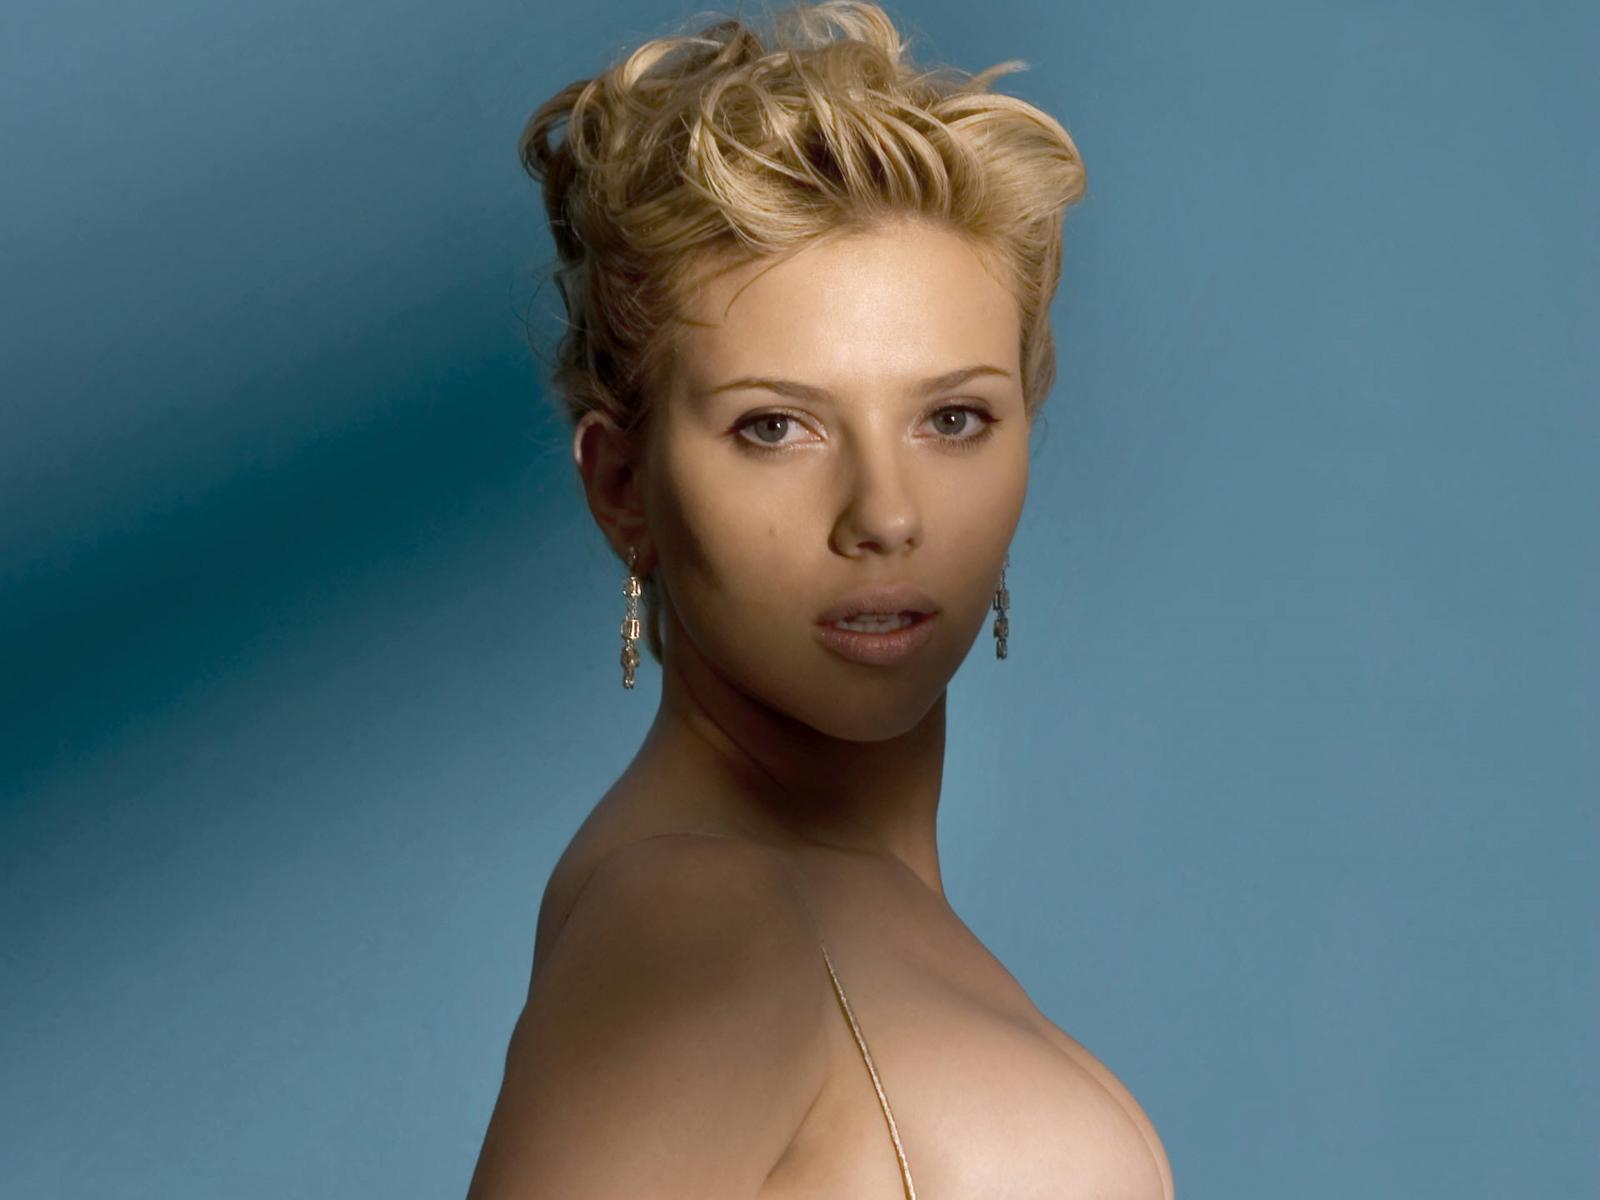 http://4.bp.blogspot.com/-mBdY--Sx84E/Tr1Hu7VBe-I/AAAAAAAAJDs/77J-wvO6HK0/s1600/Scarlett_Johansson_Wallpapers_GORGEOUS_BODY.jpg